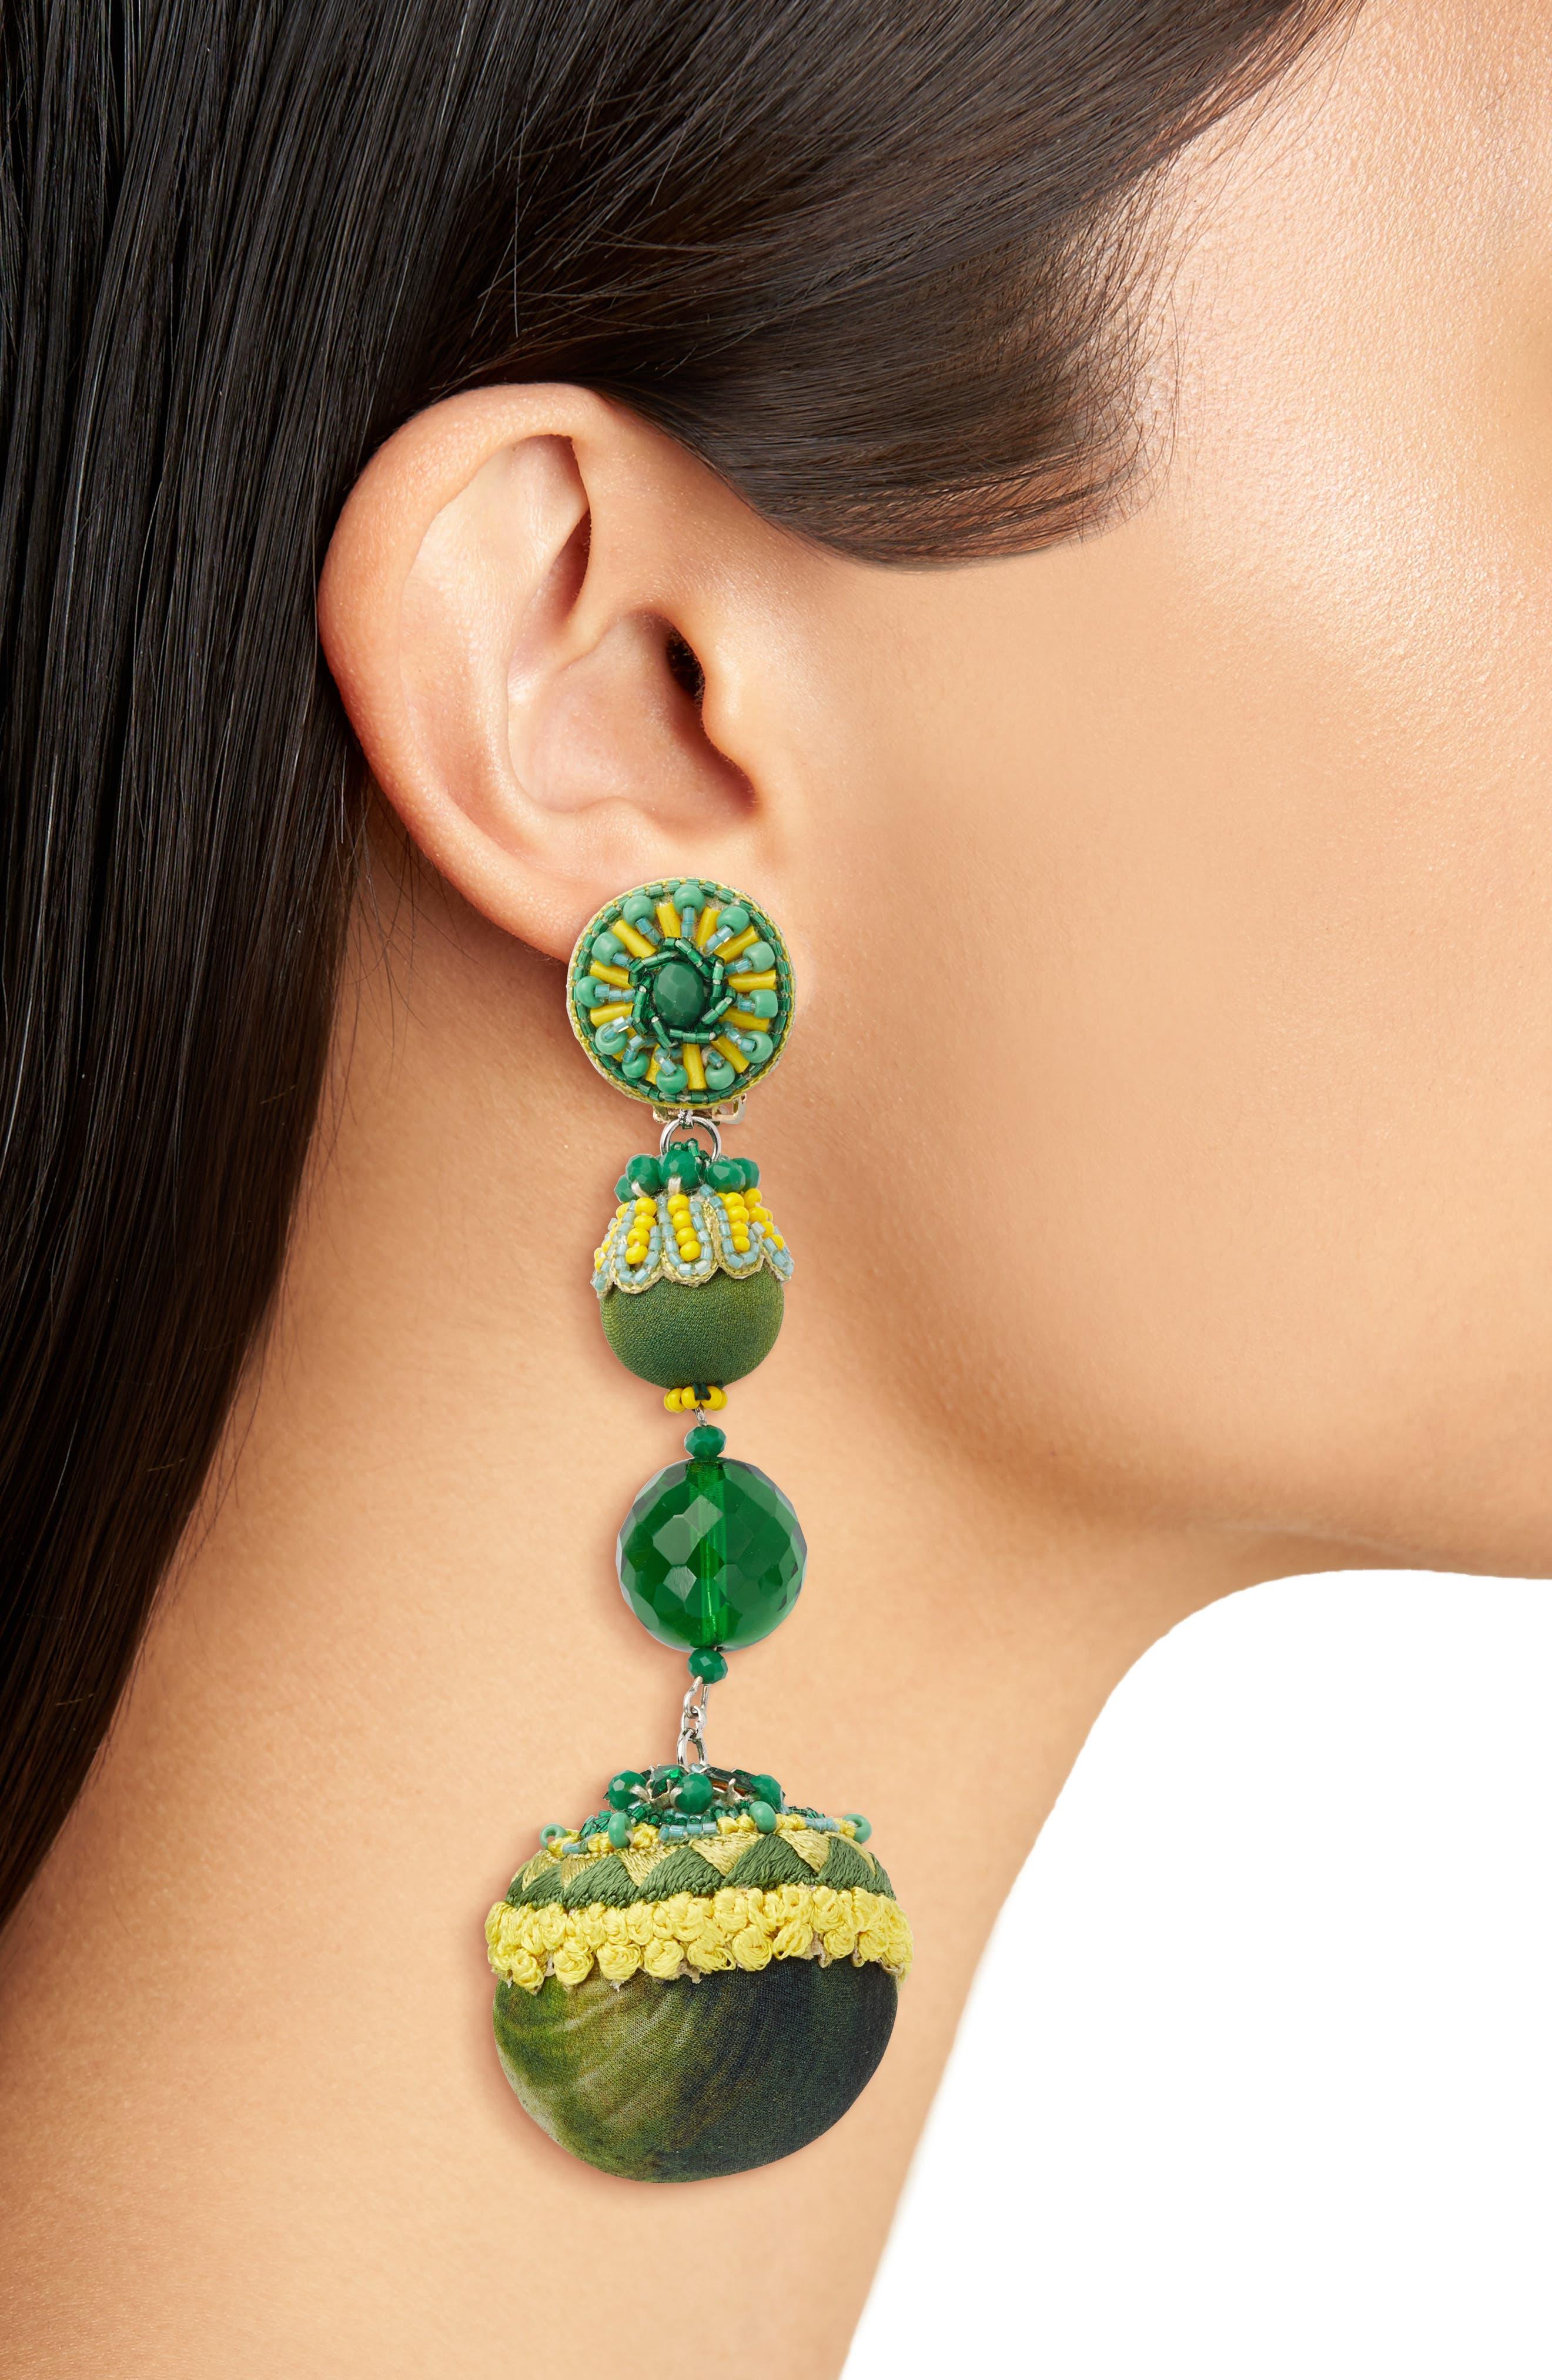 Lily Linear Earrings,                             Alternate thumbnail 2, color,                             300